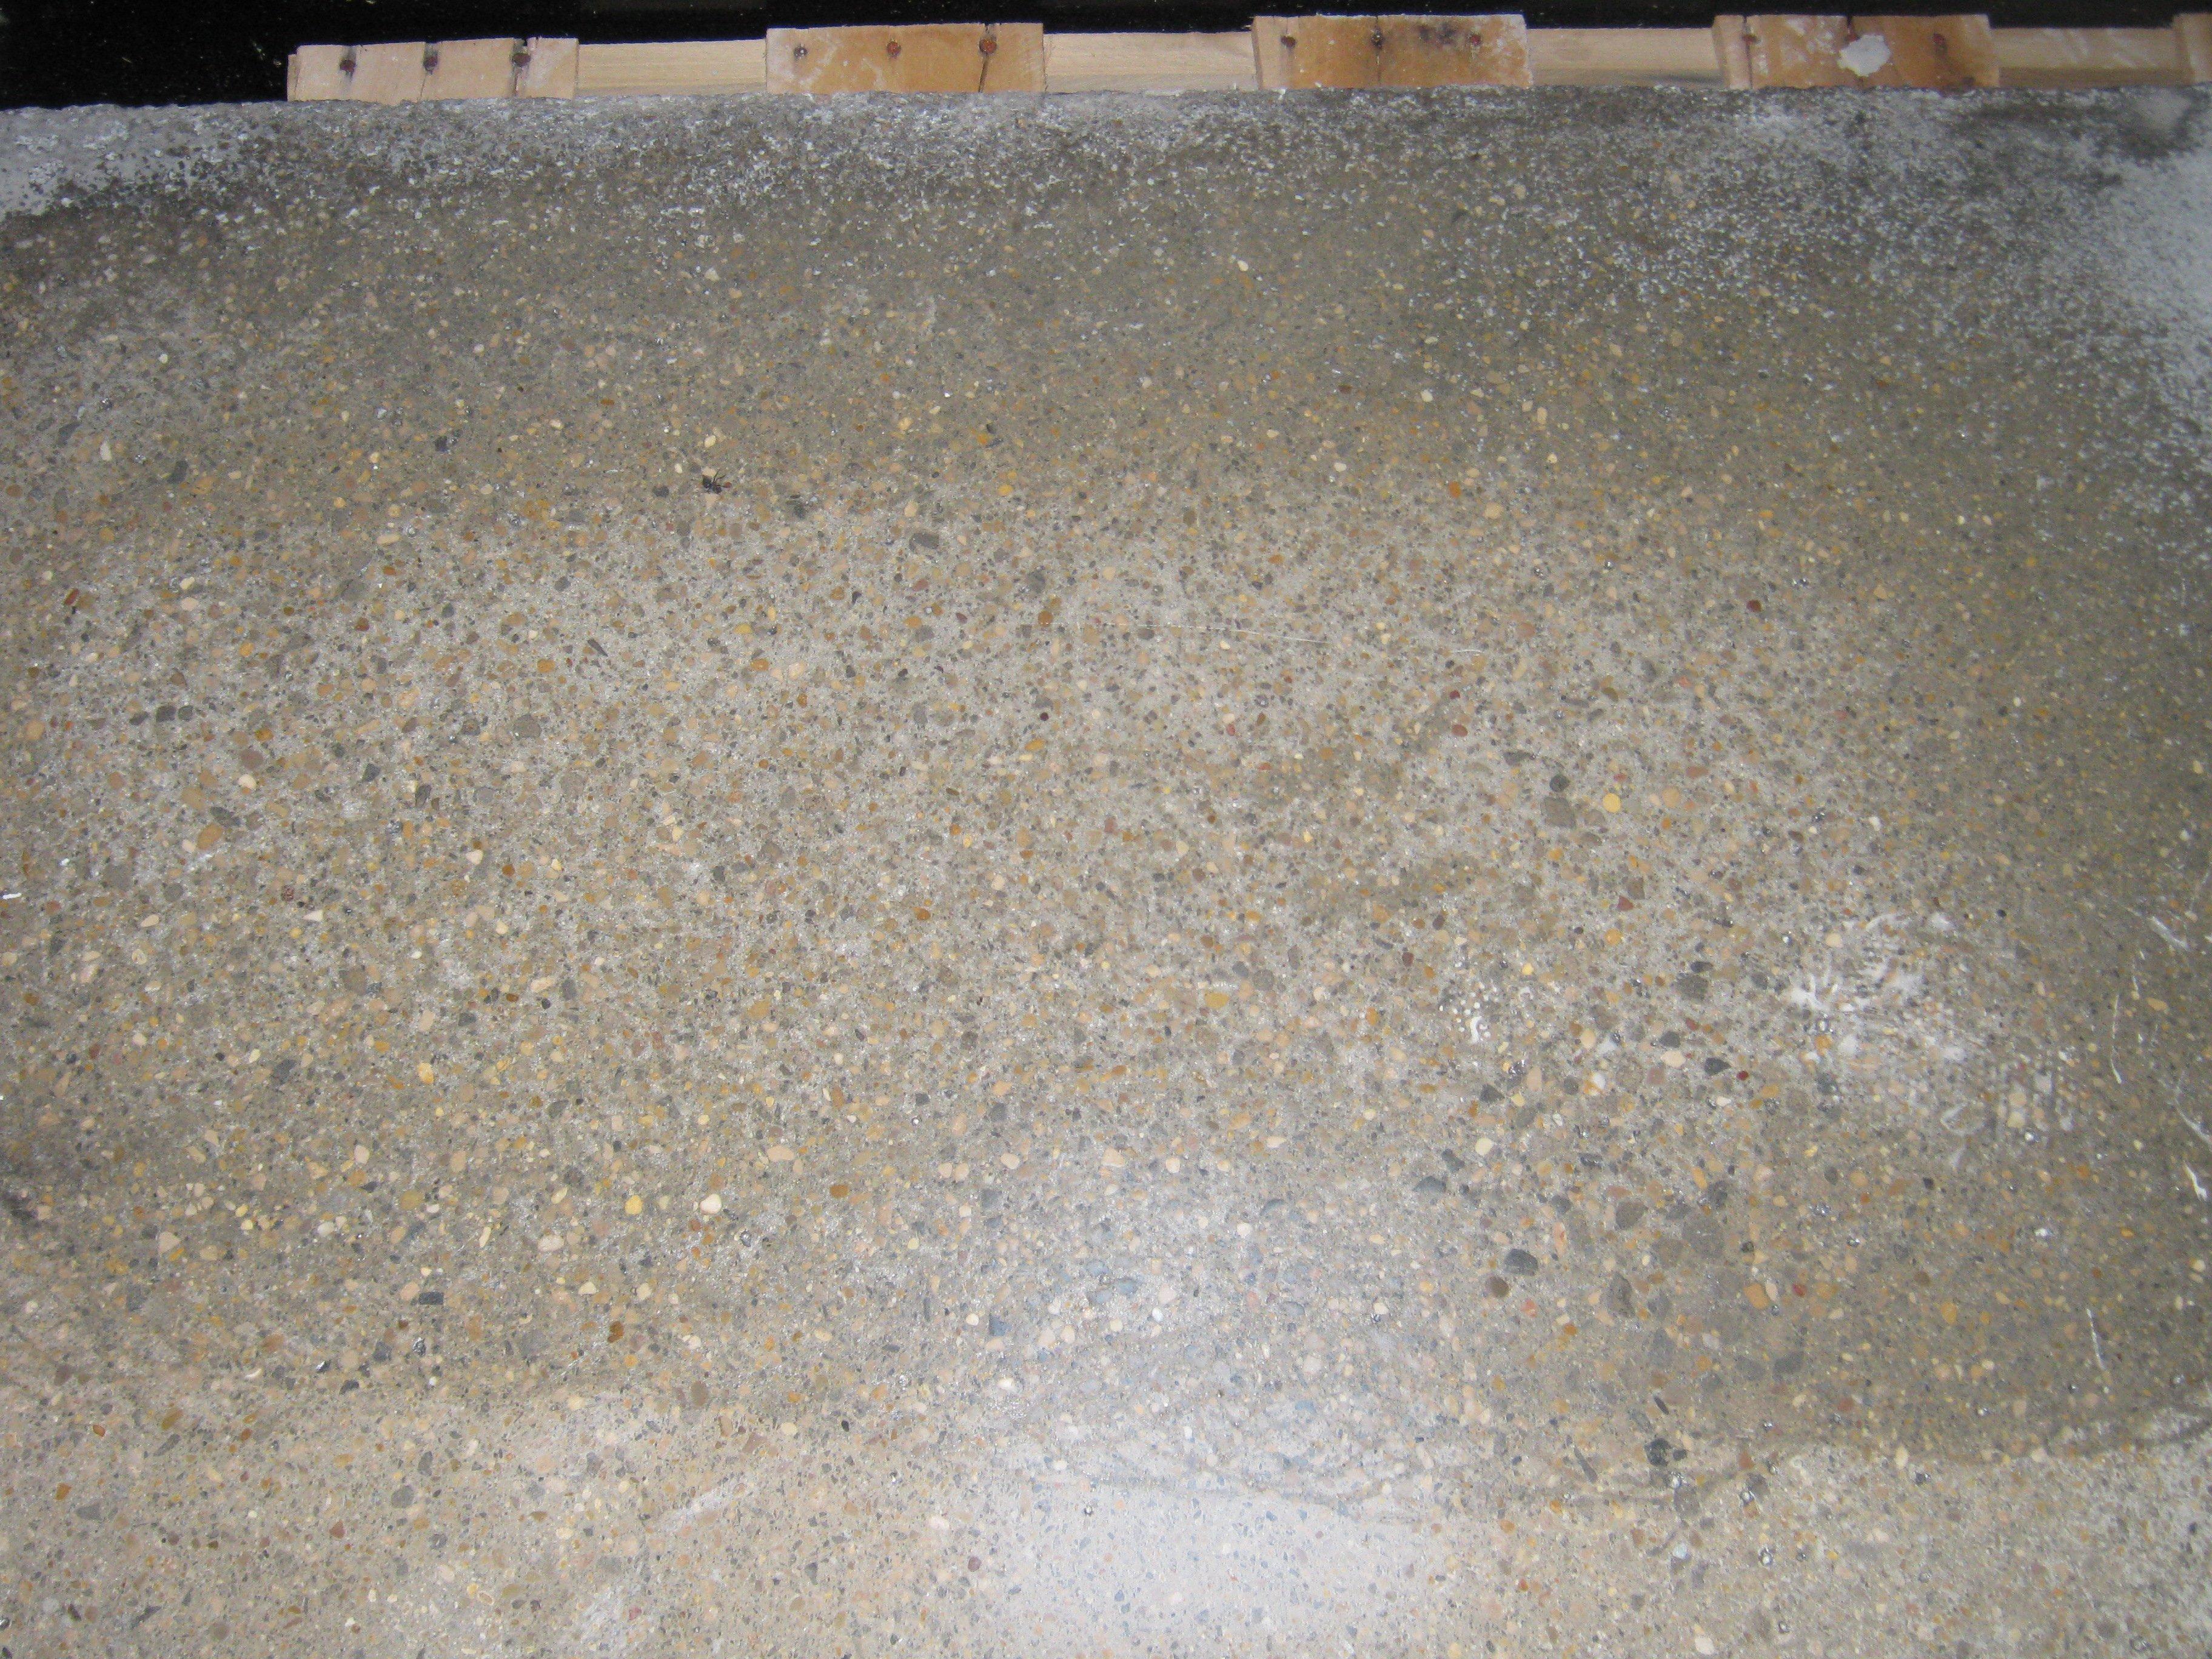 Sol beton brut interieur zn06 jornalagora for Beton sol interieur